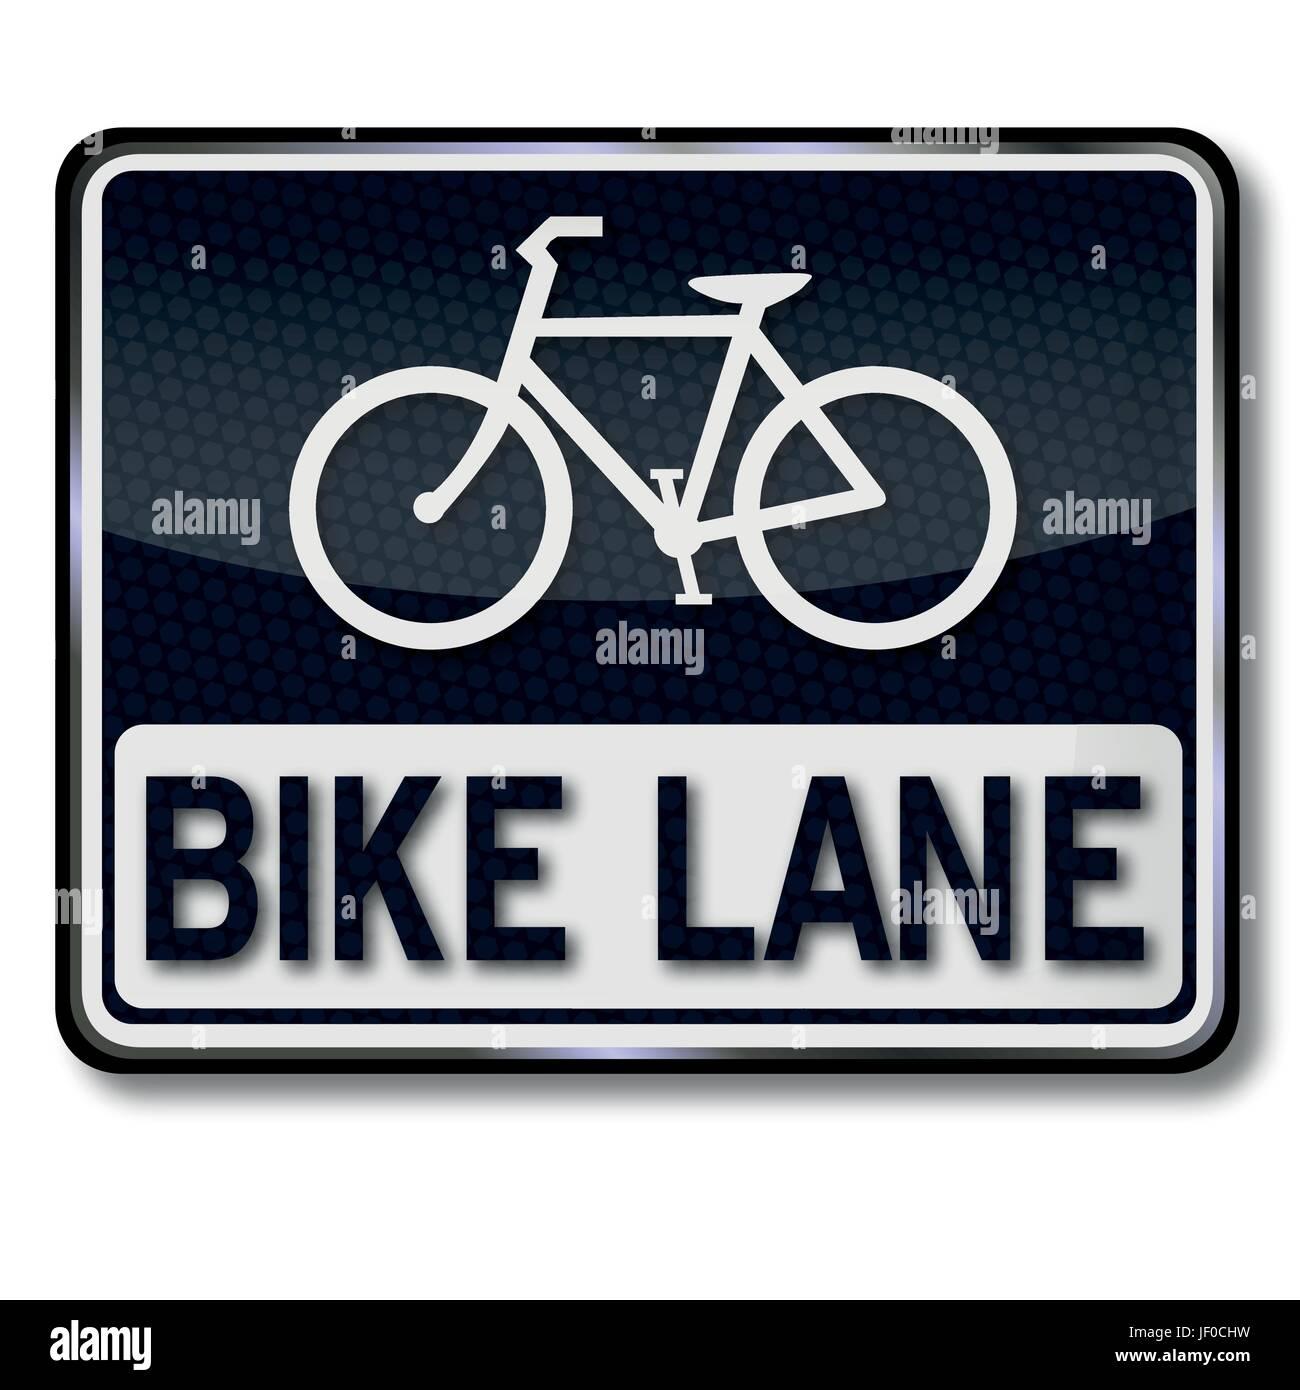 shield bike lane - Stock Image